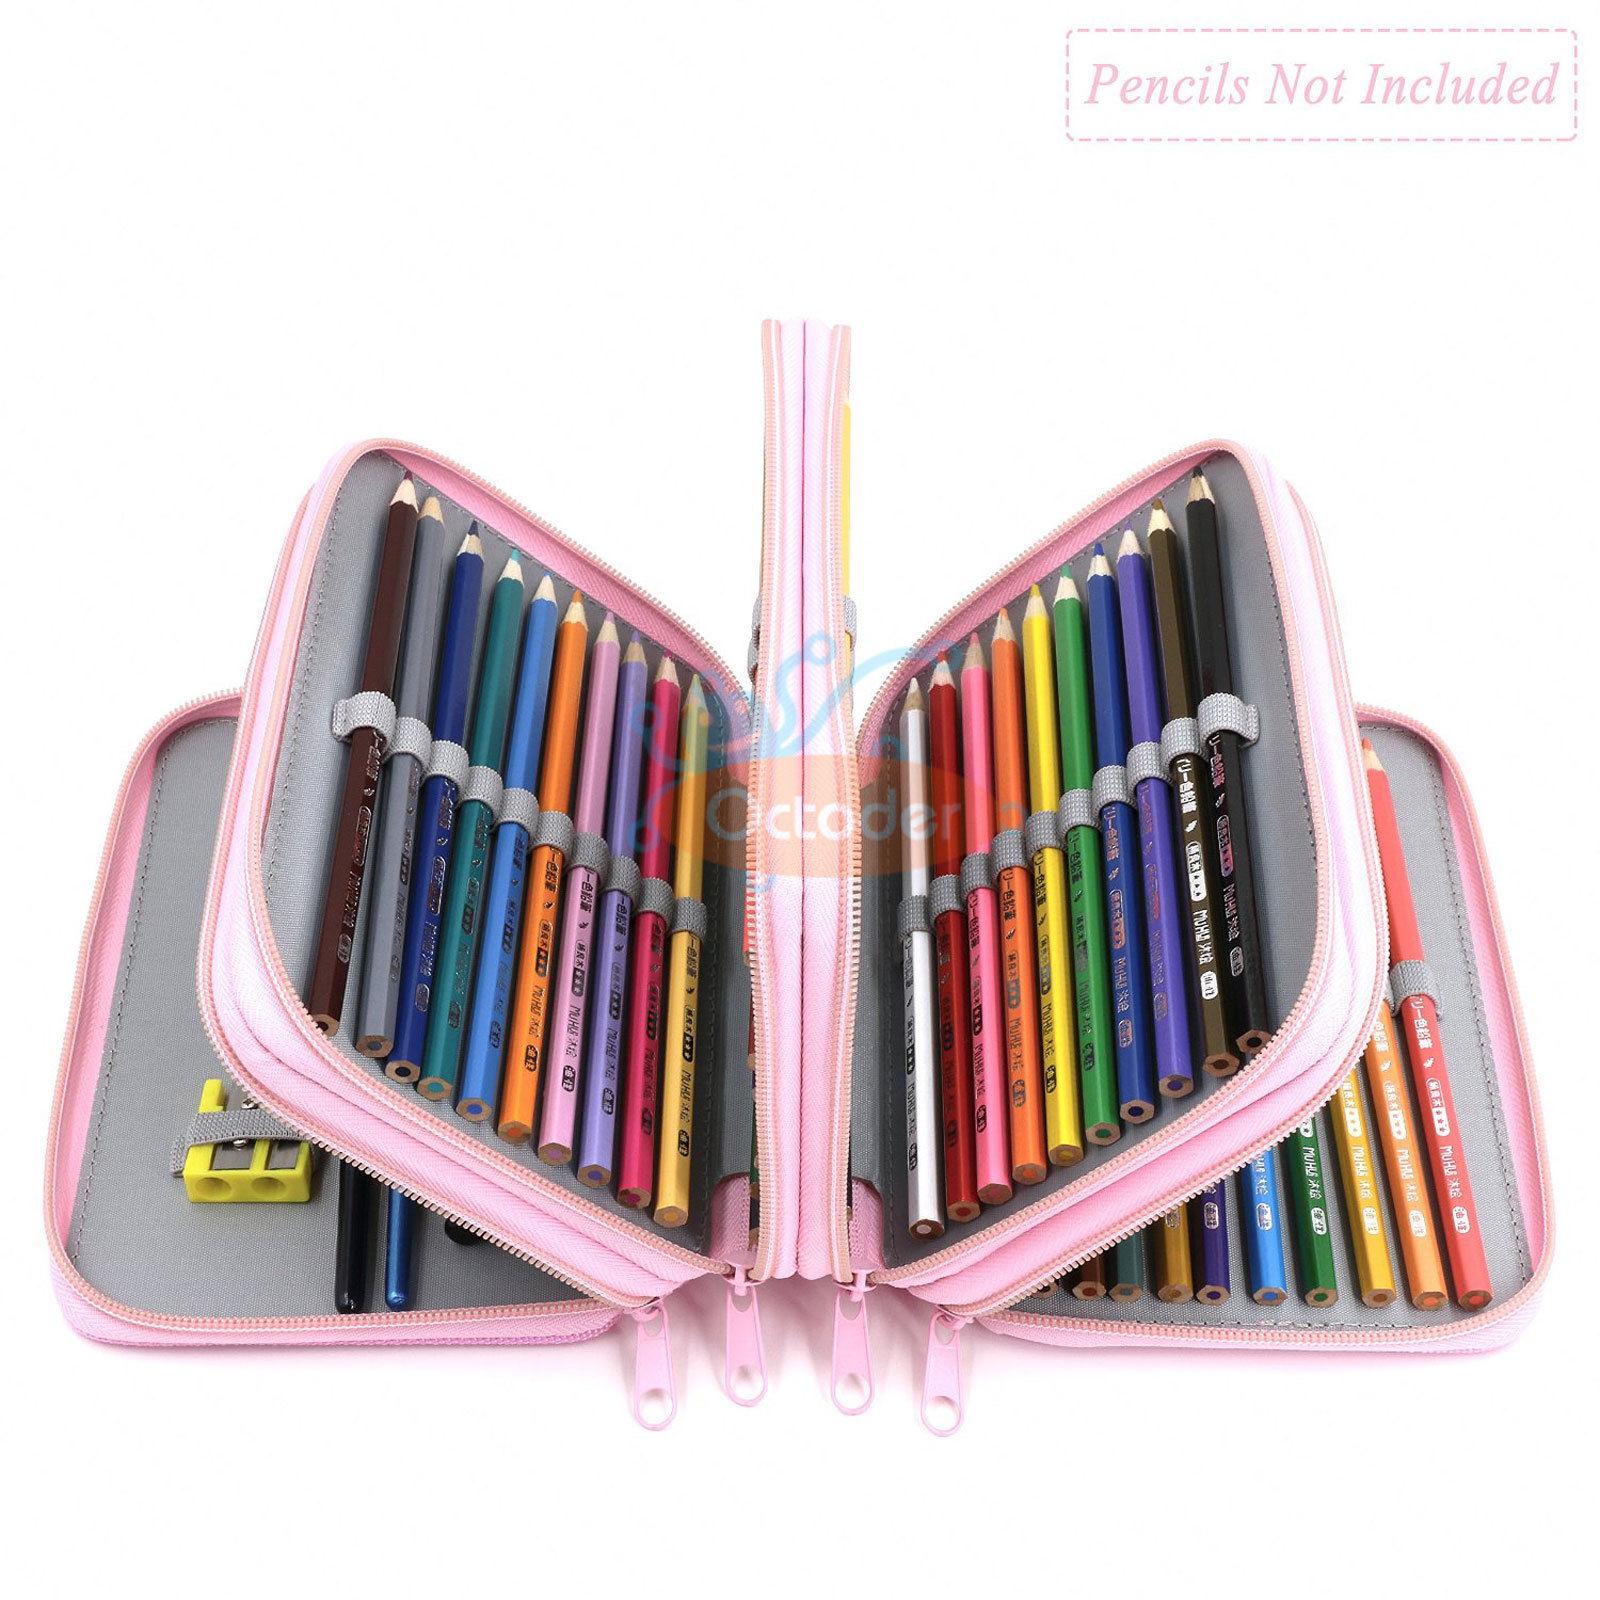 4-Layers-High-Capacity-Pencil-Brush-Case-Box-Pen-Pouch-Bag-Makeup-Storage-Bag thumbnail 22